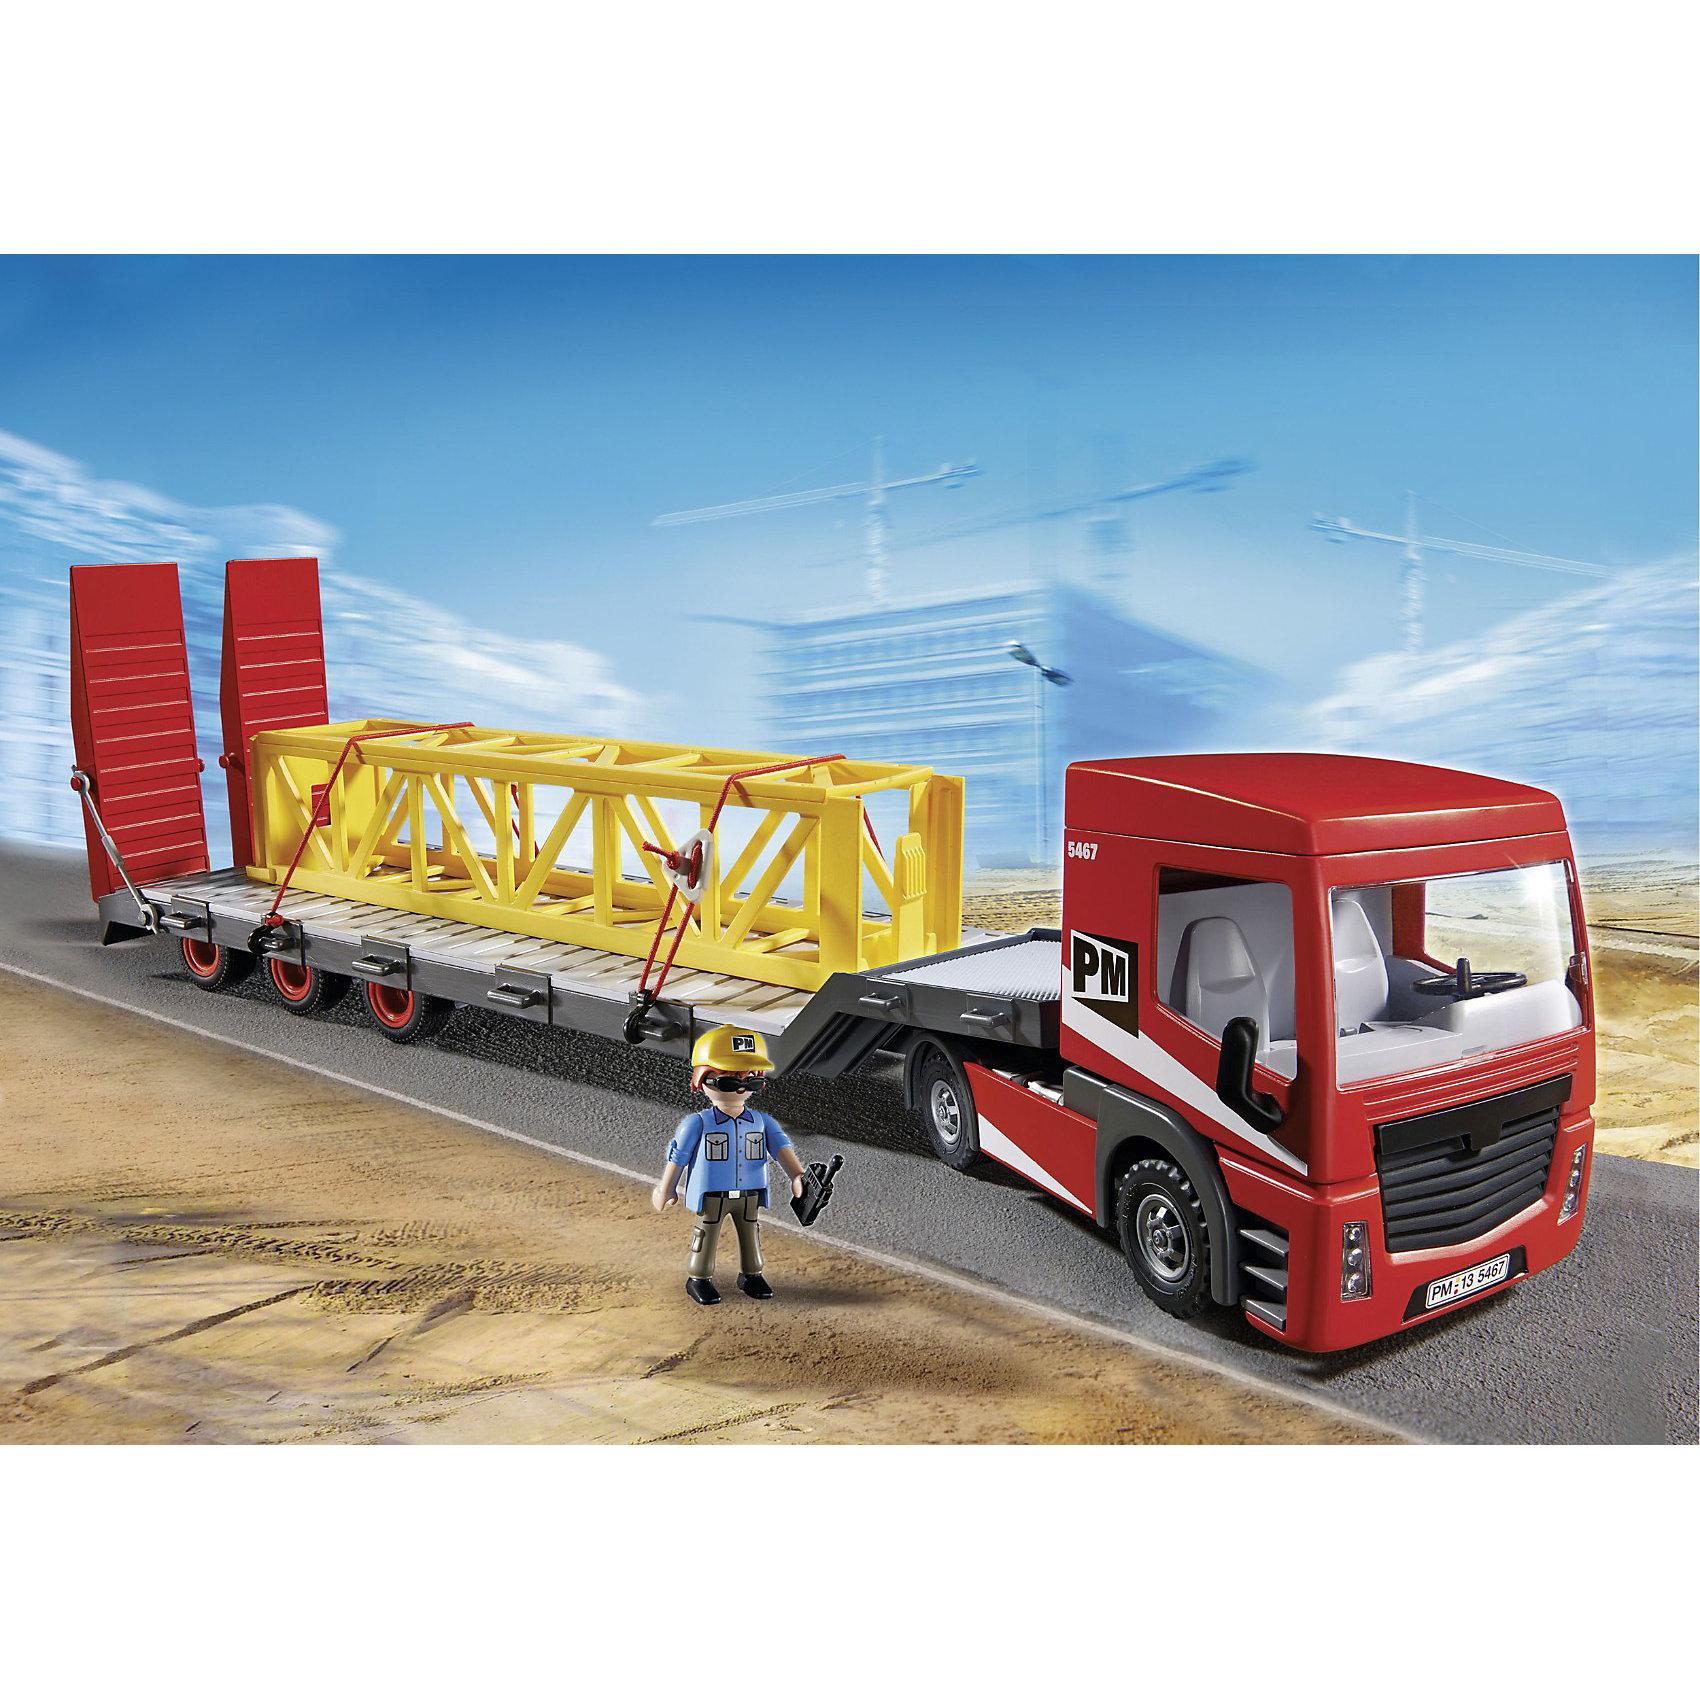 PLAYMOBIL® PLAYMOBIL 5467 Стройка: Большой грузовик playmobil спасатели с носилками